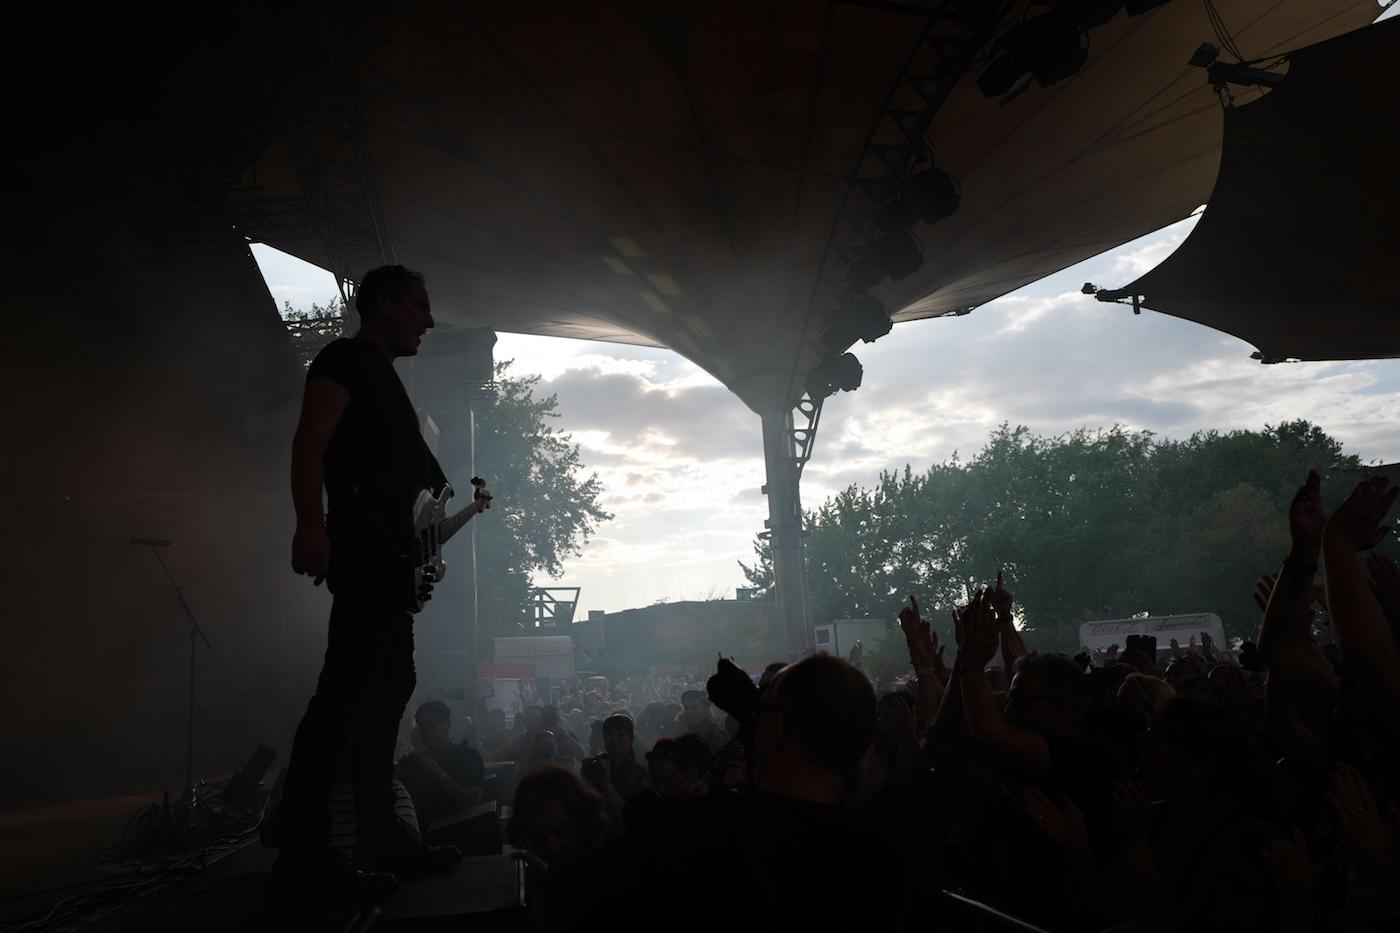 mark_benecke_amphi_festival_koeln_cologne_tanzbrunnen_gothic_OMD_oomph_agonoize_mono_inc_es23_sitd_solar_fake - 71.jpg